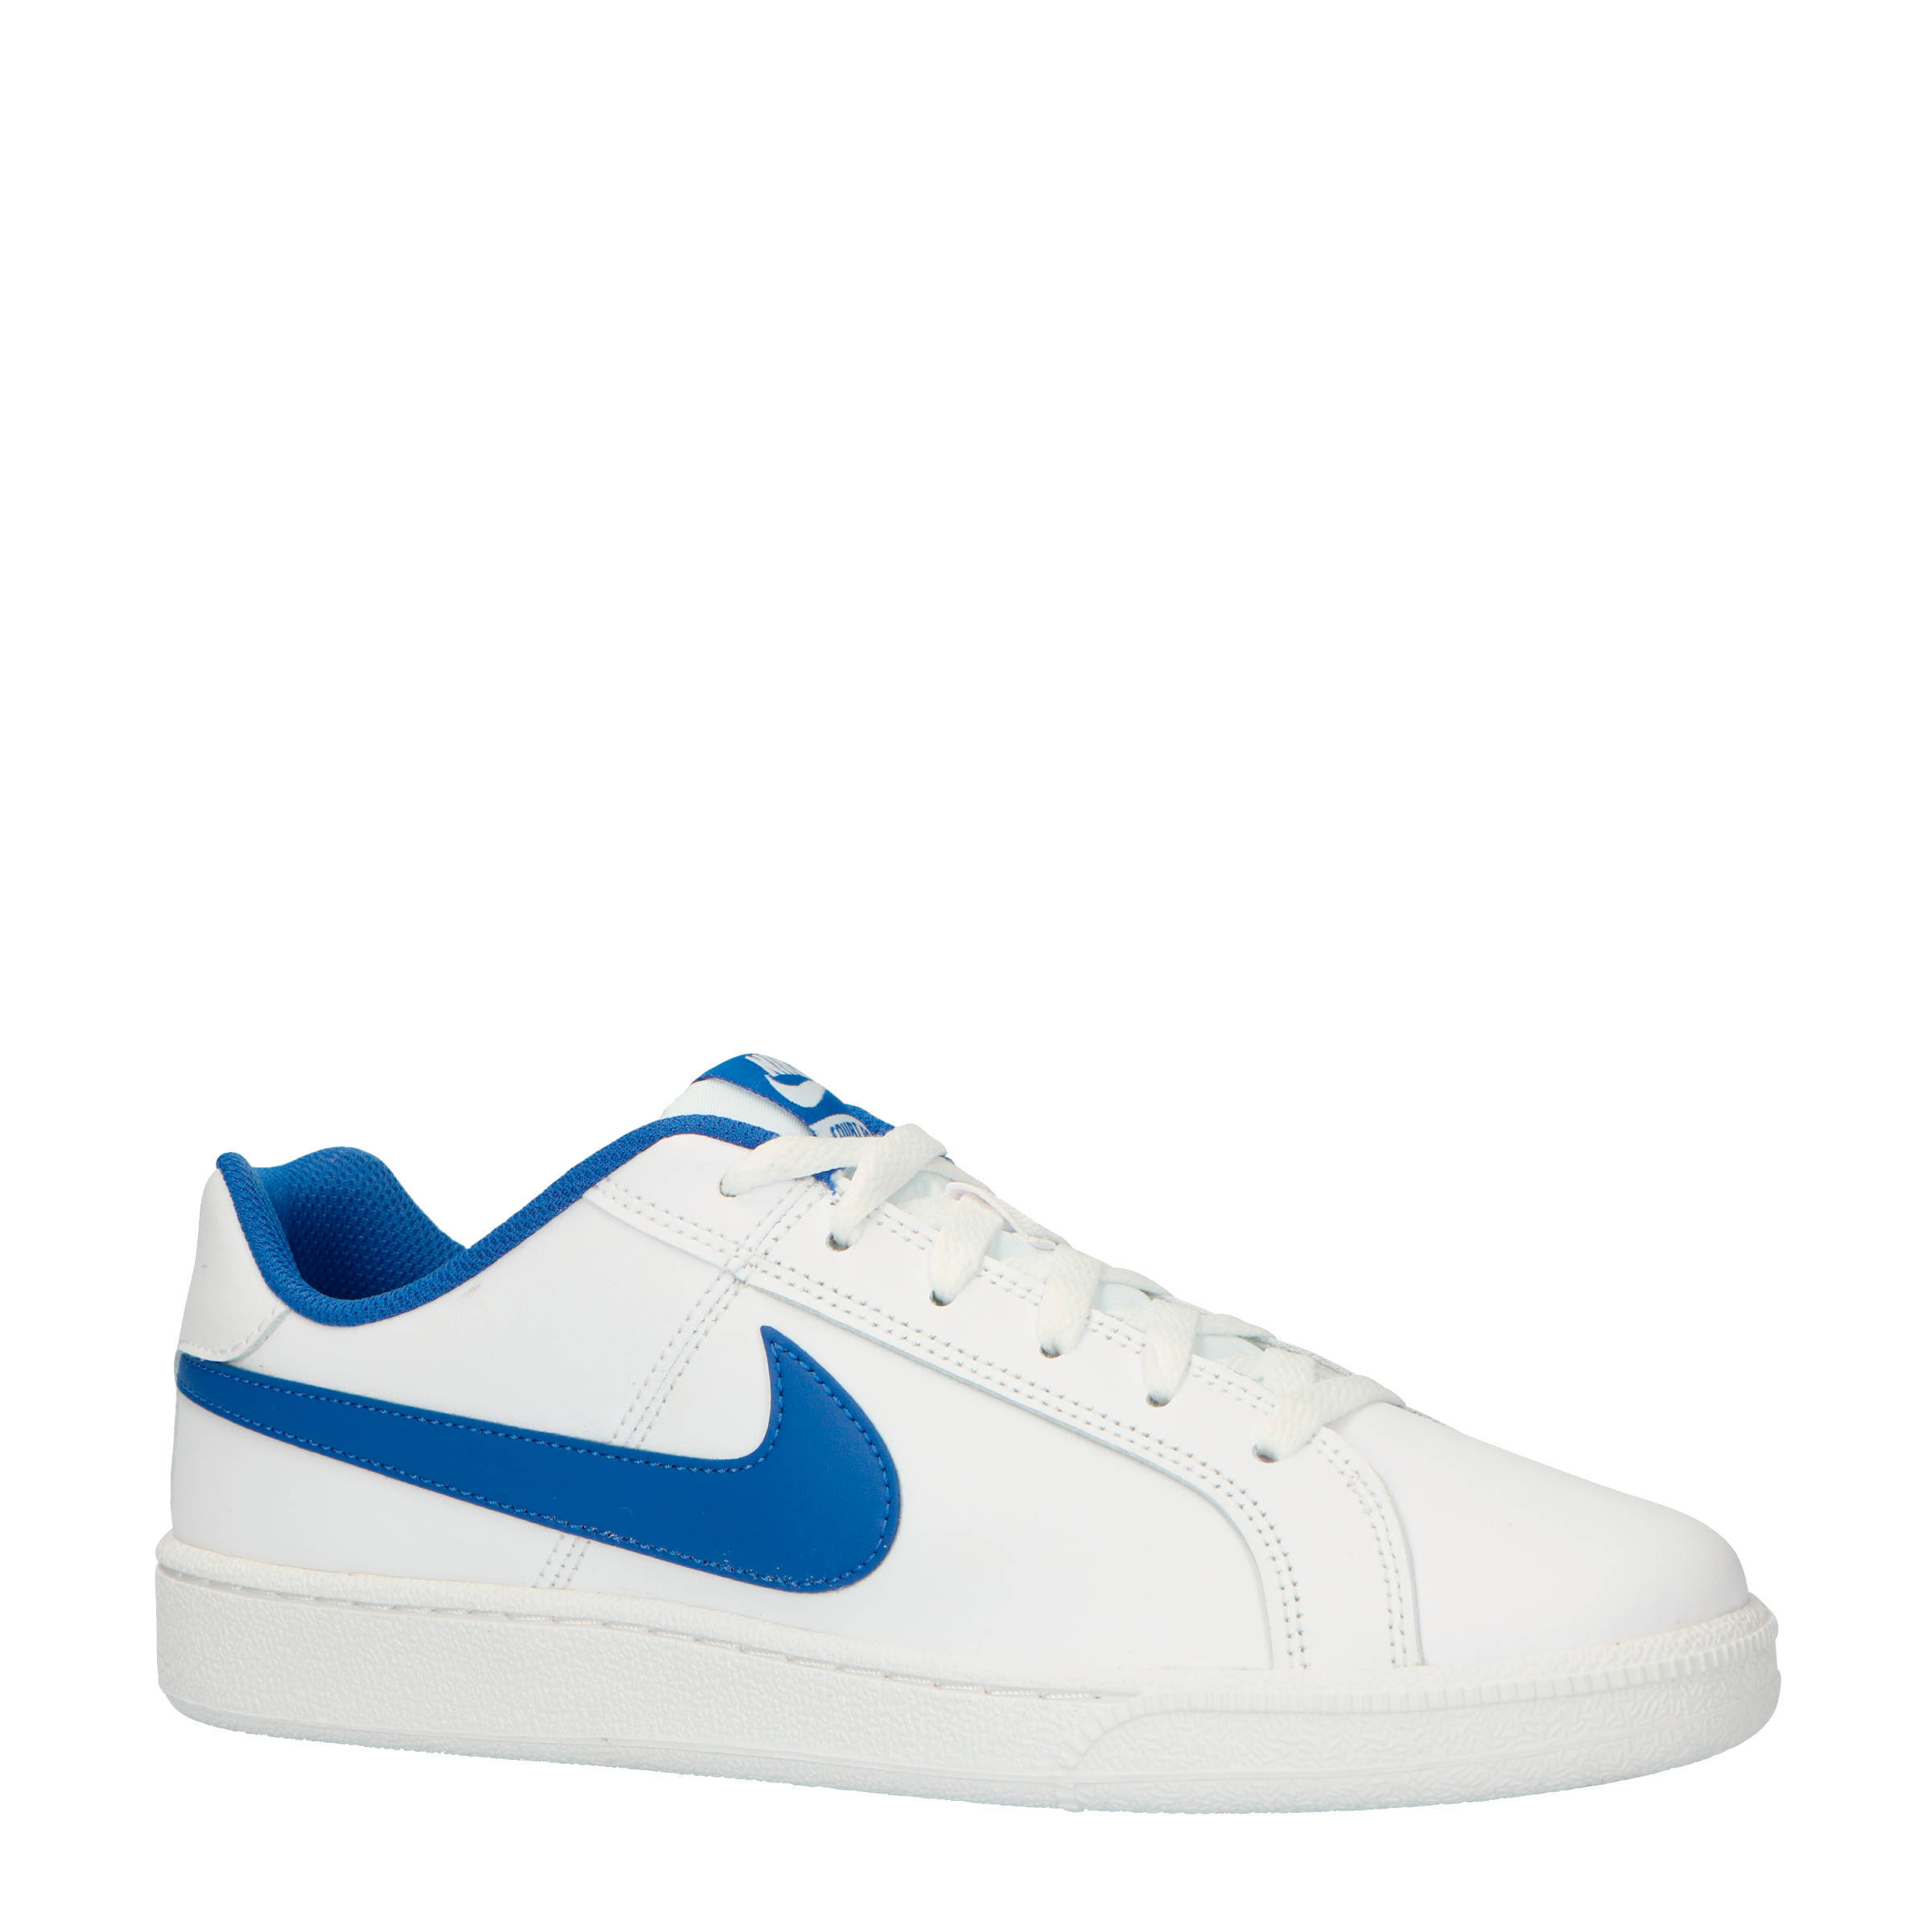 Nike Court Royale leren sneakers wit/blauw | wehkamp